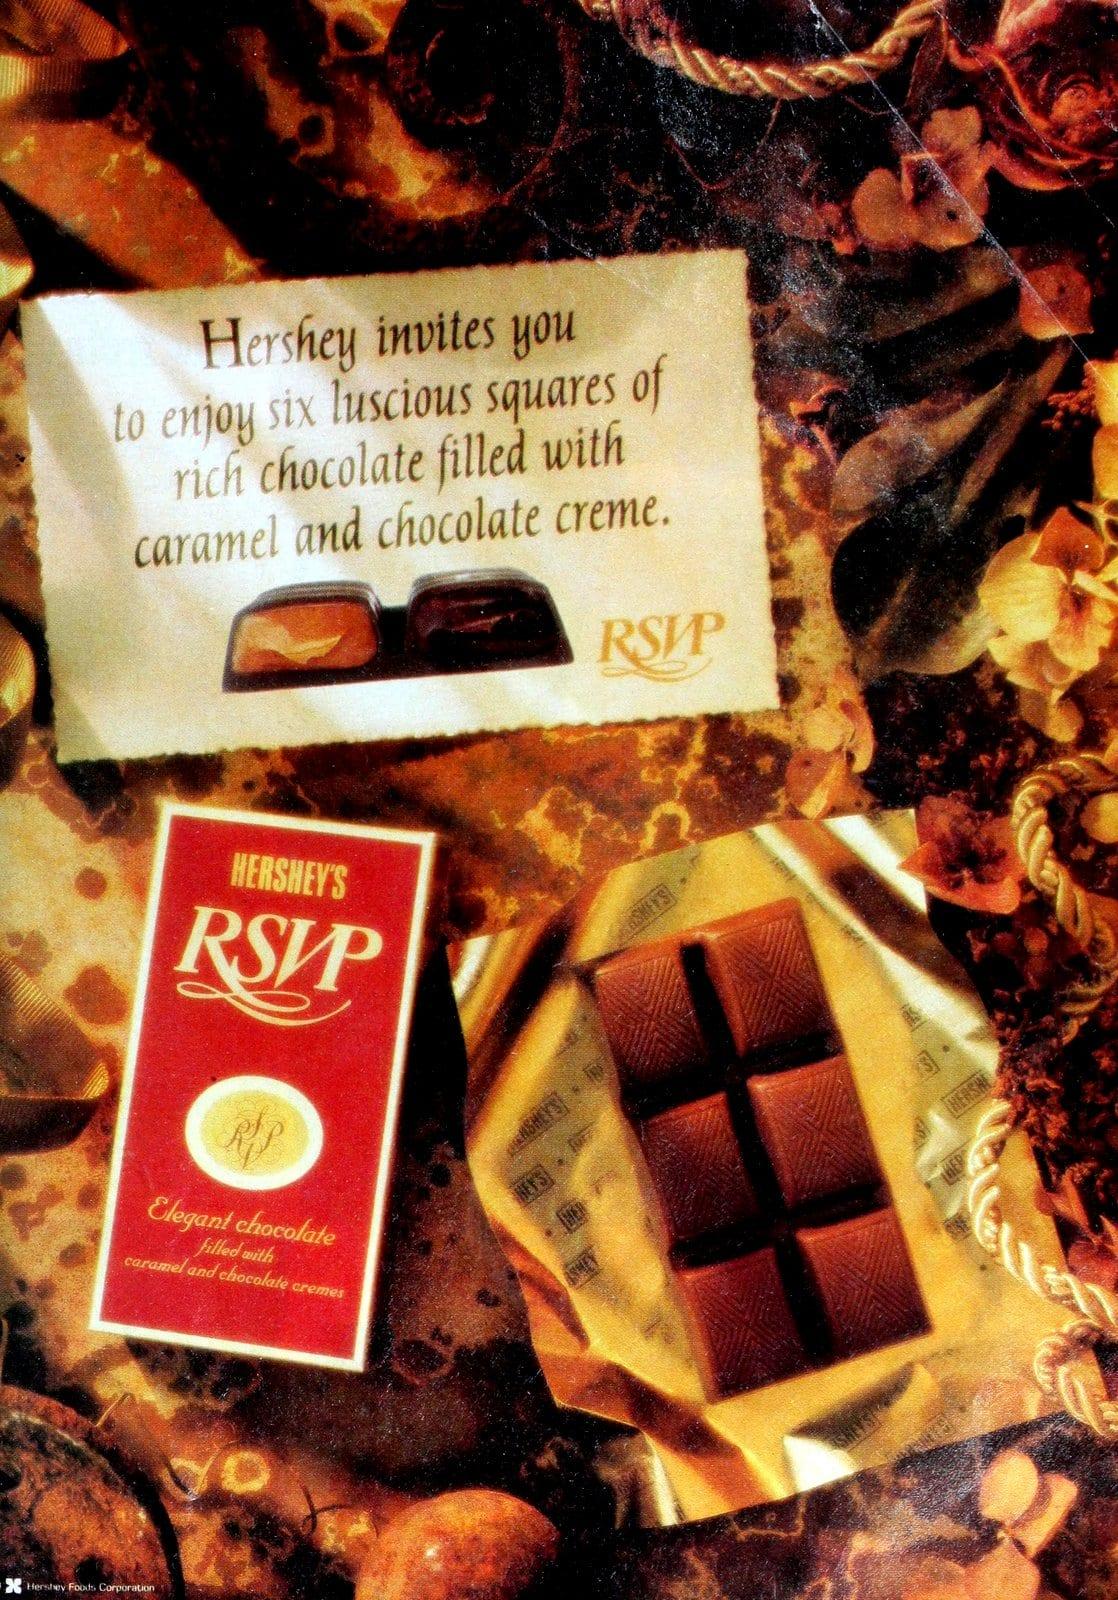 Retro candy - Hershey's RSVP chocolate squares (1990)